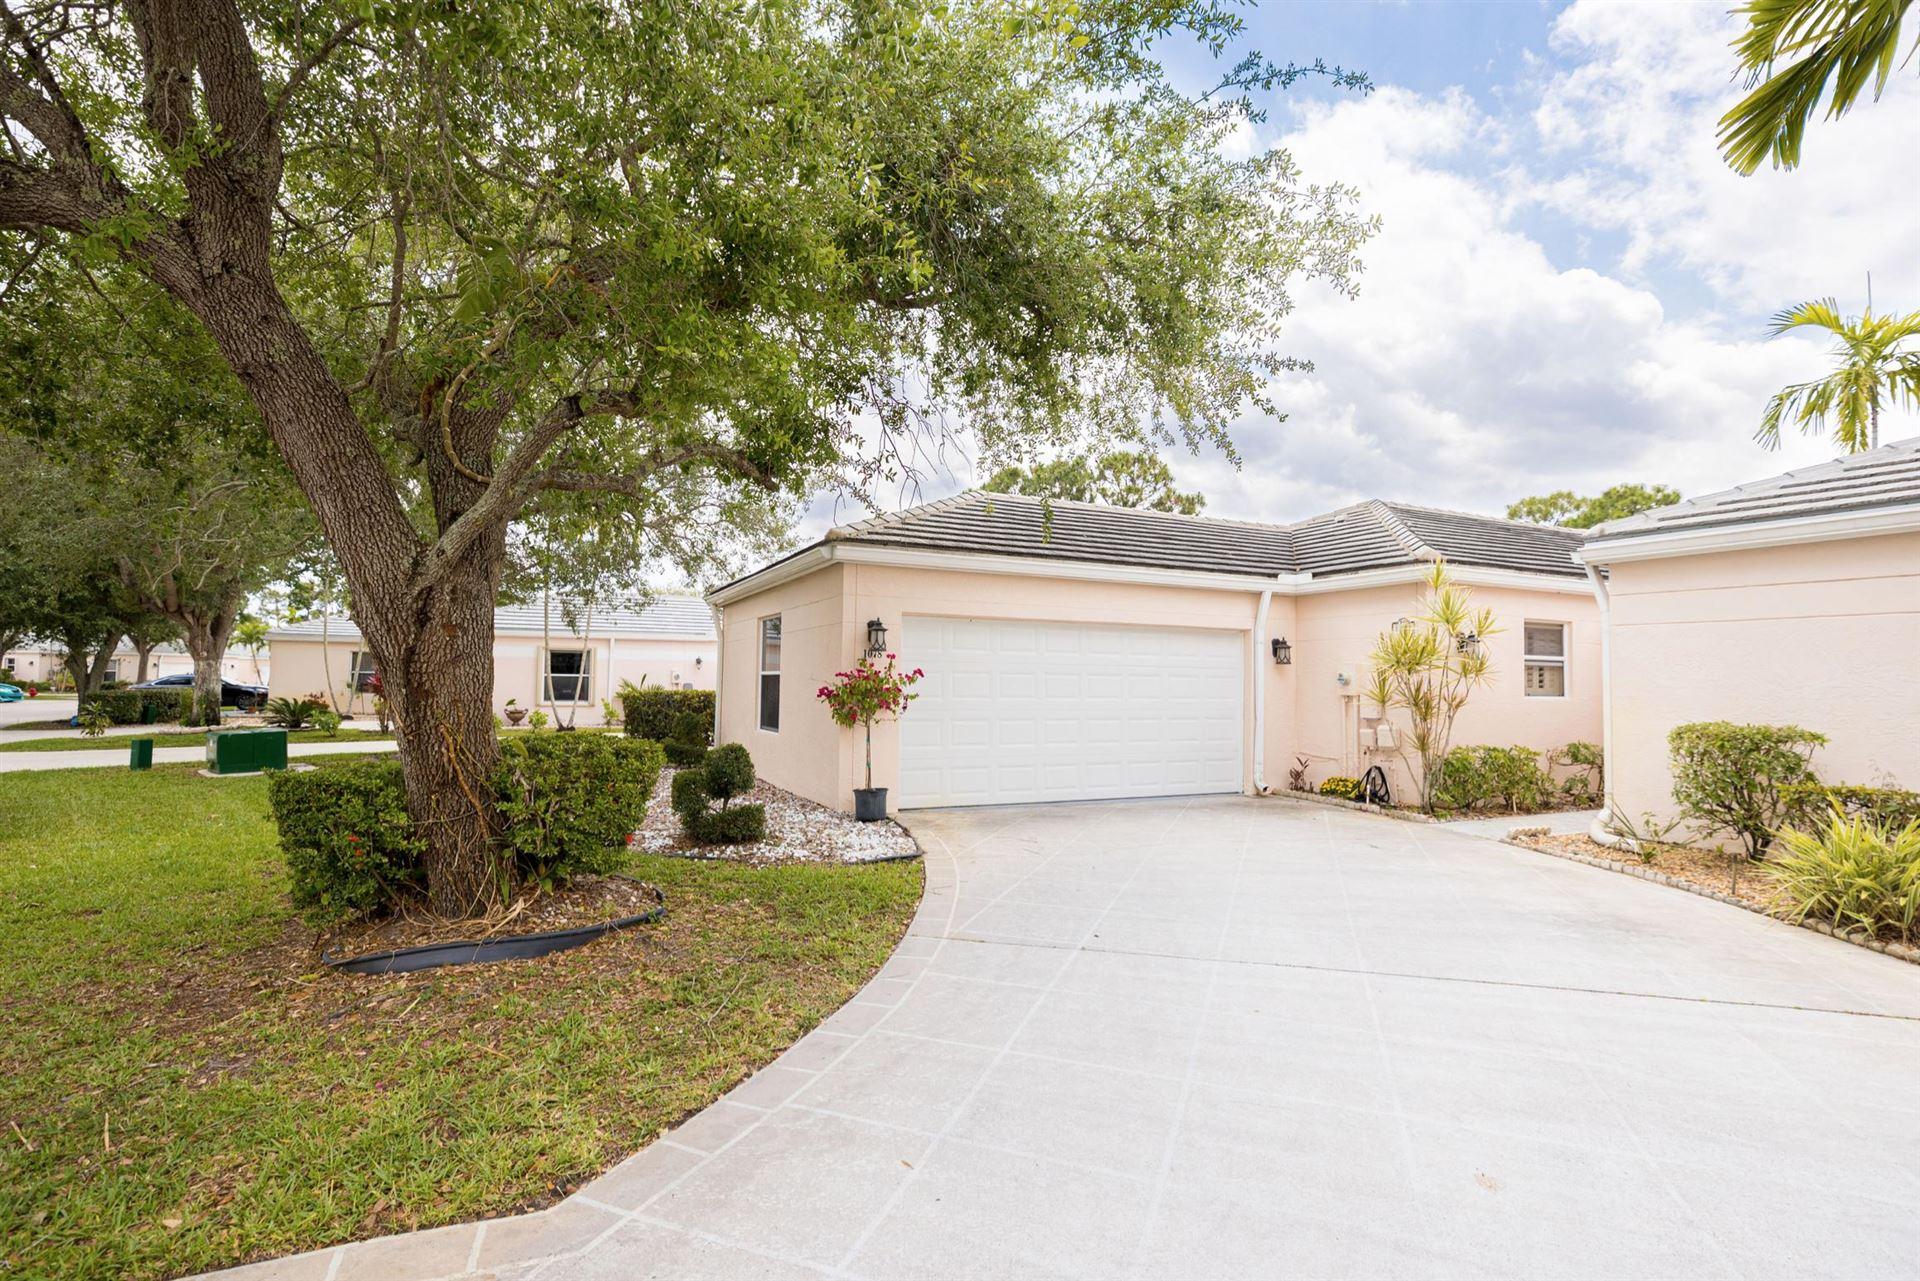 1078 Island Manor Drive, Greenacres, FL 33413 - MLS#: RX-10709708